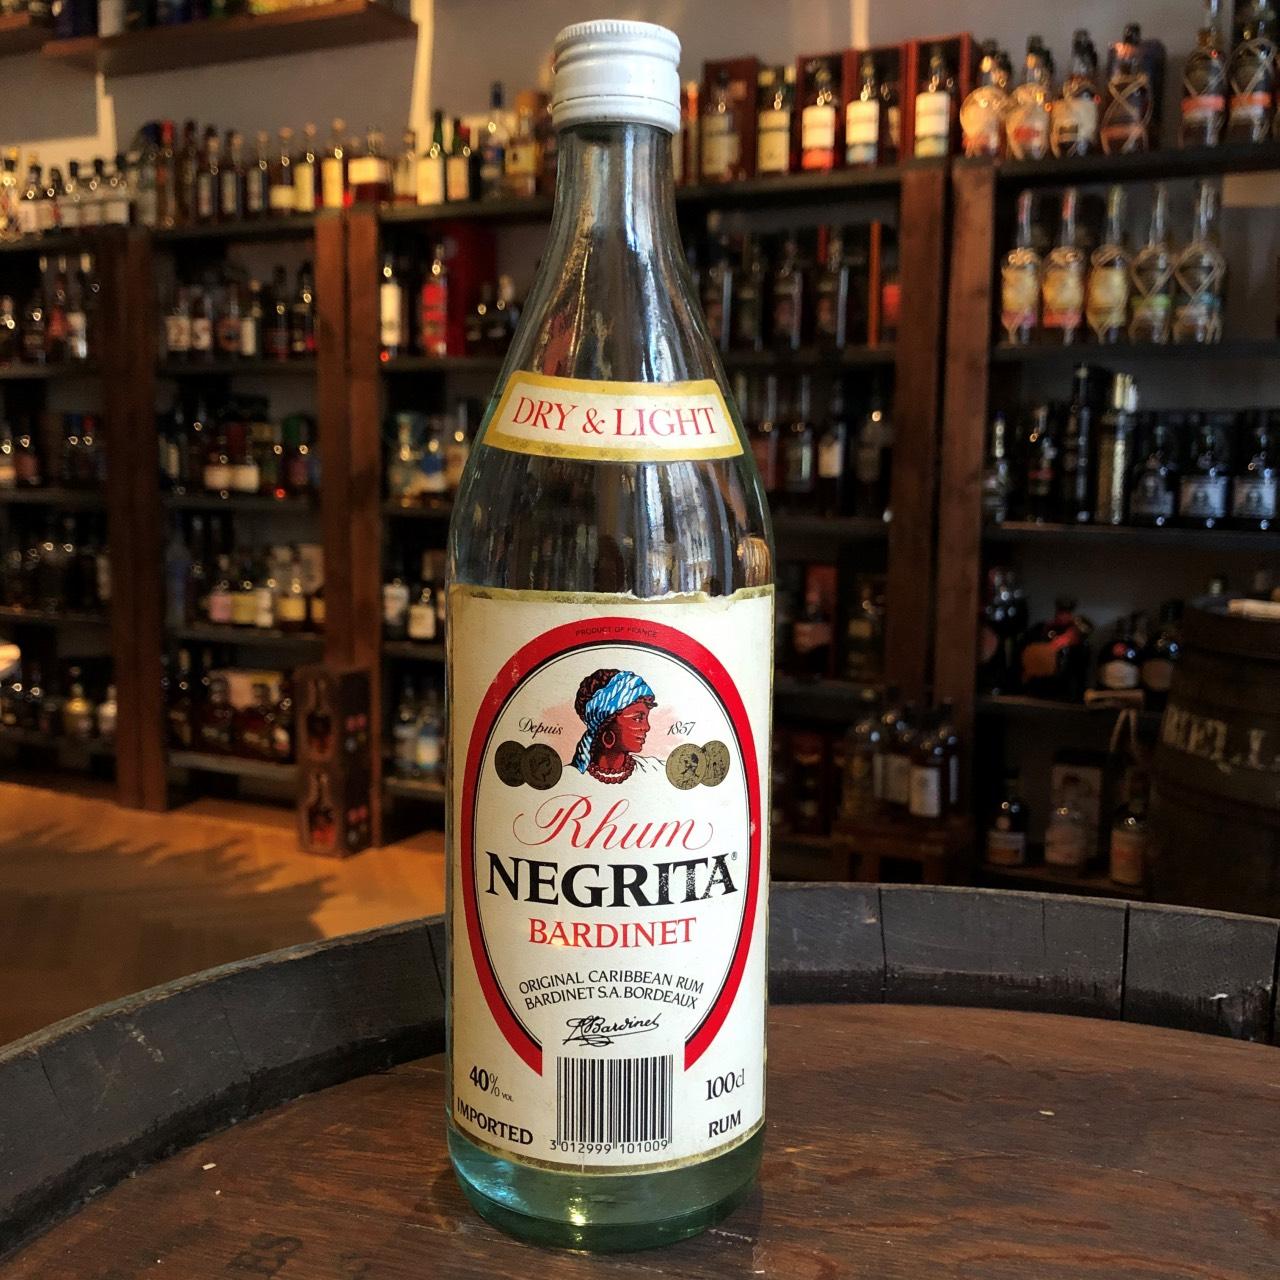 Bottle image of Rhum Negrita Bardinet Dry and Light